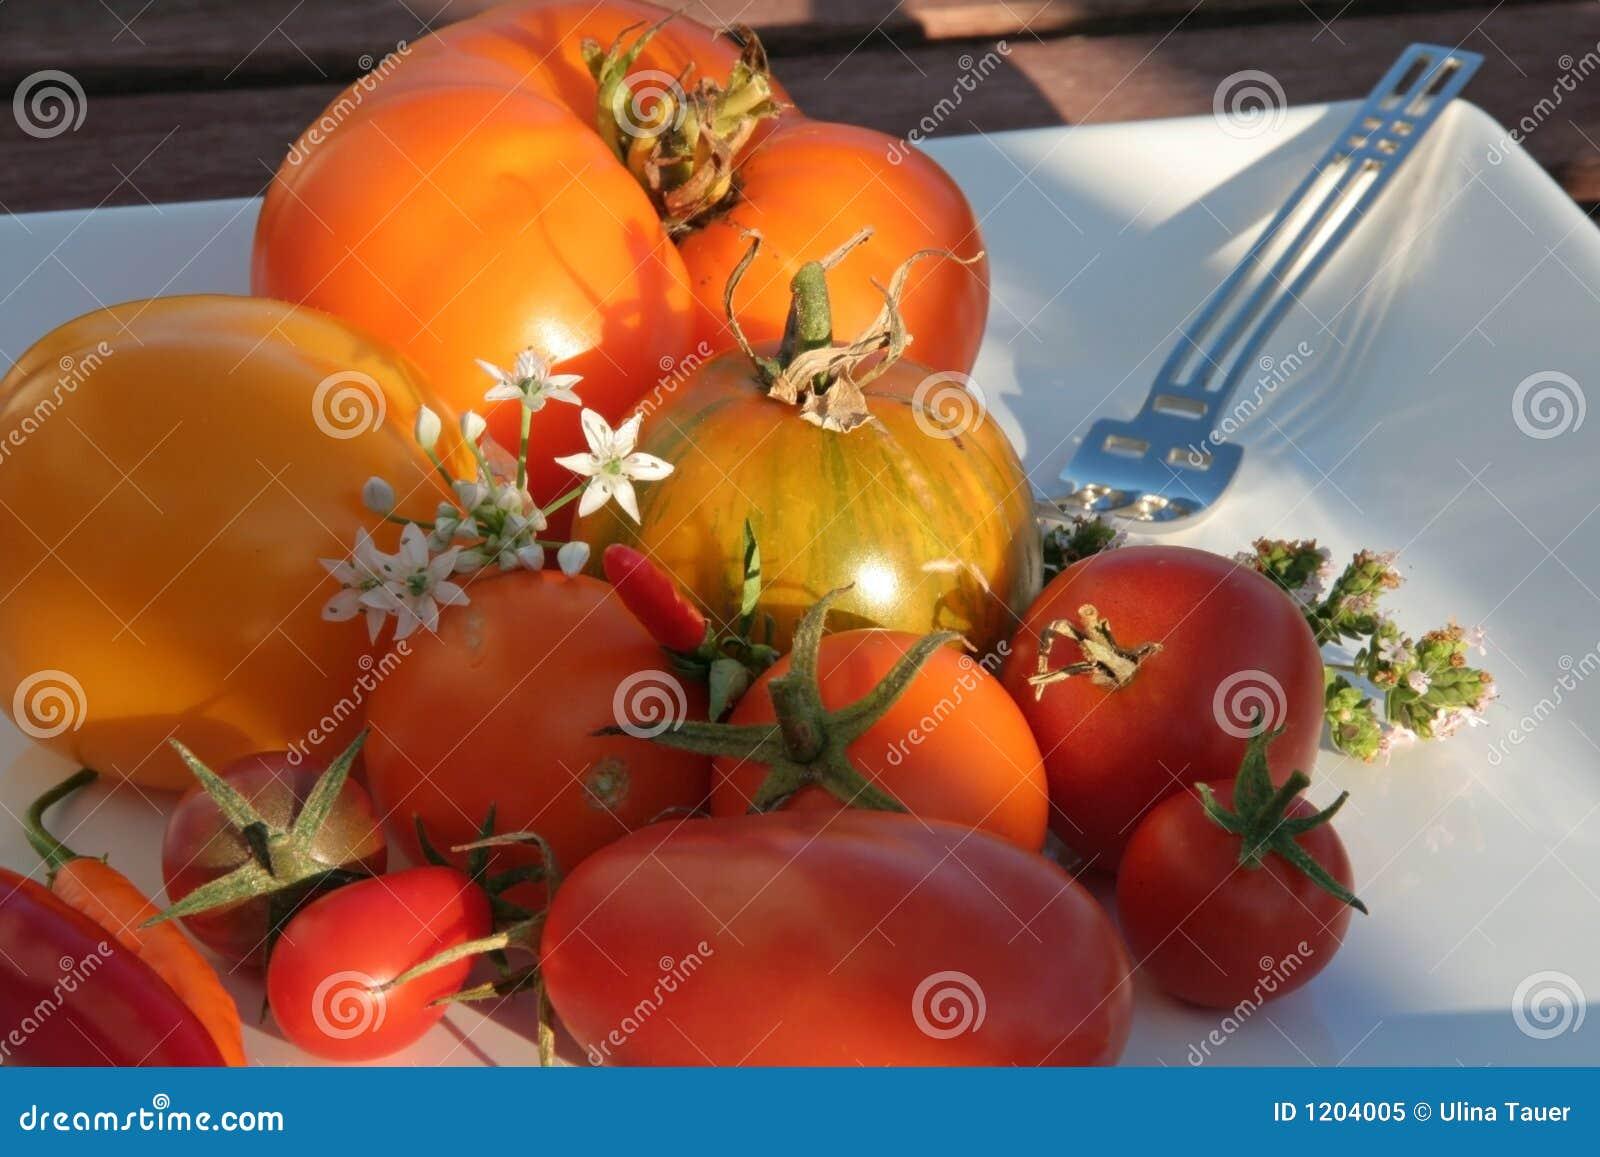 Summerly Harvest 8